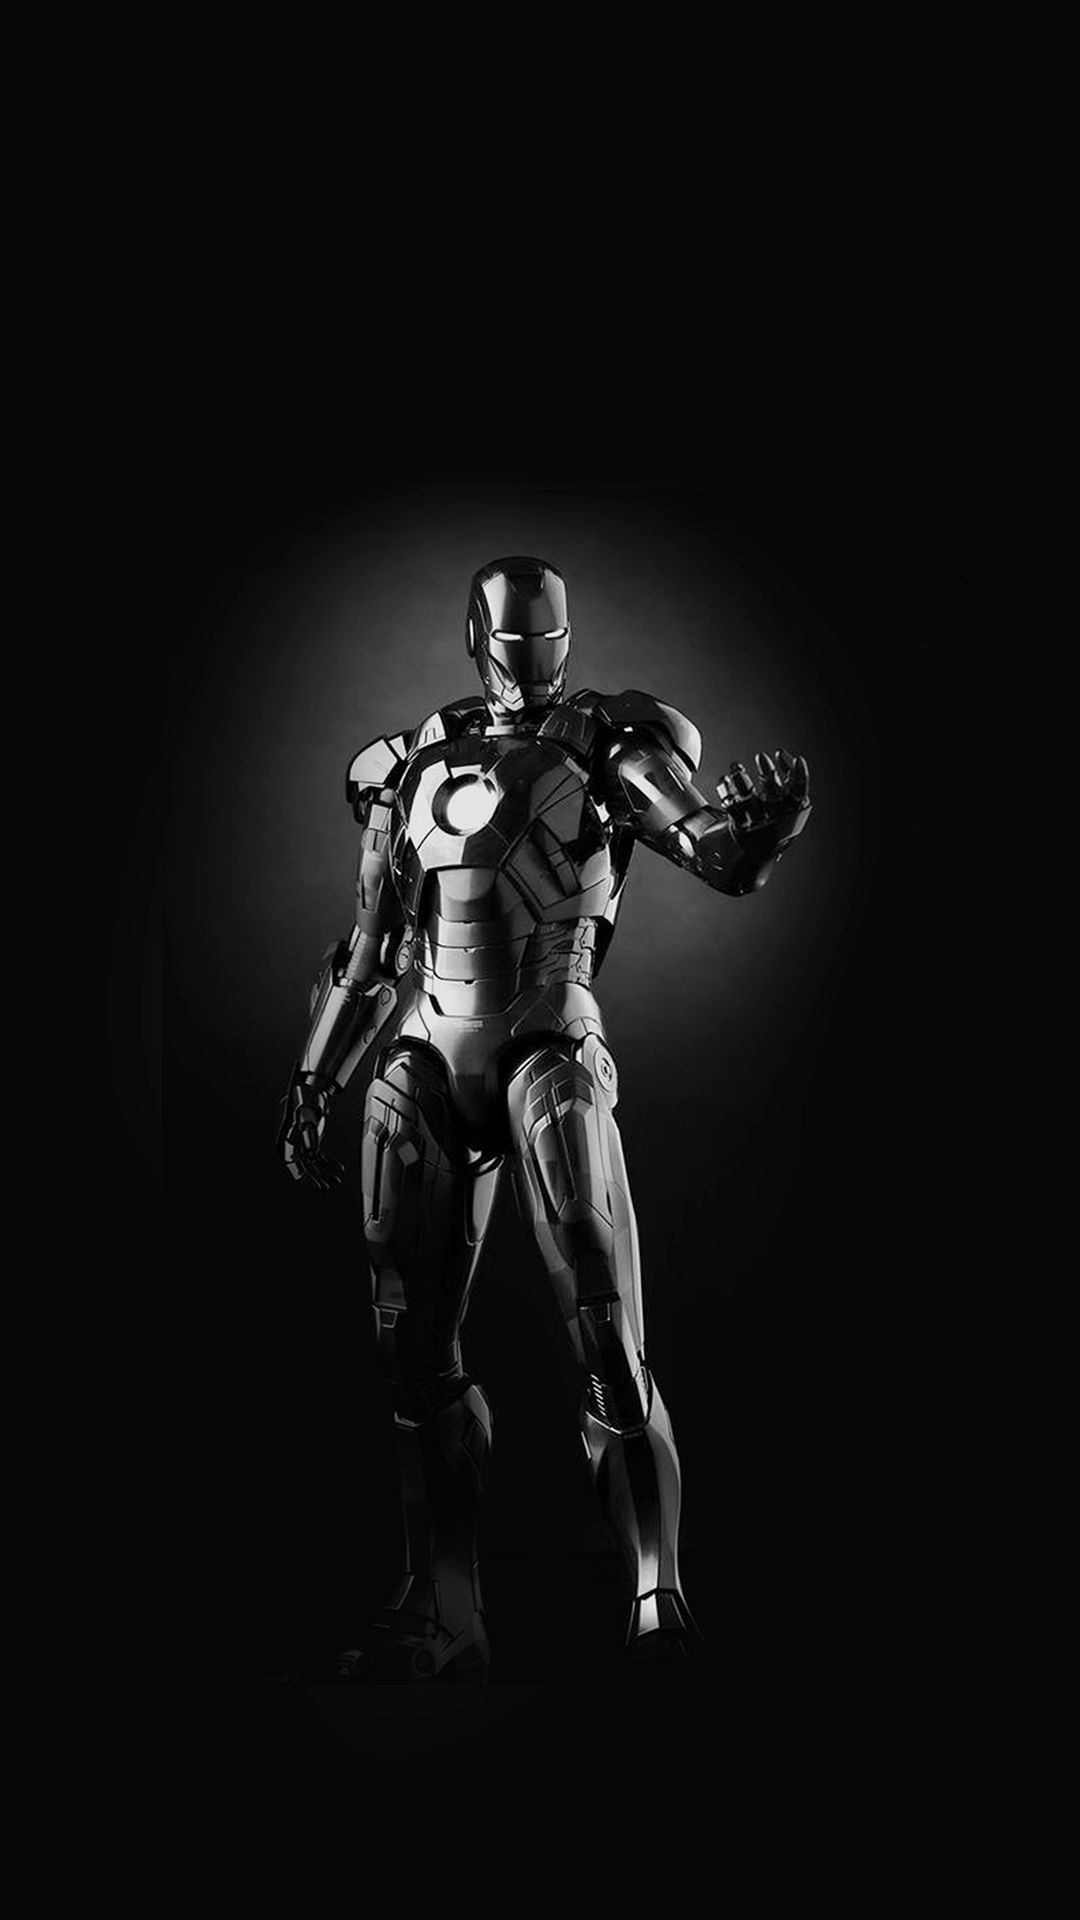 Ironman Dark Figure Hero Art Avengers Bw Iphone 6 Wallpaper Download Iphone Wallpapers Ipad Wallpapers One Stop Iron Man Wallpaper Iron Man Artwork Iron Man